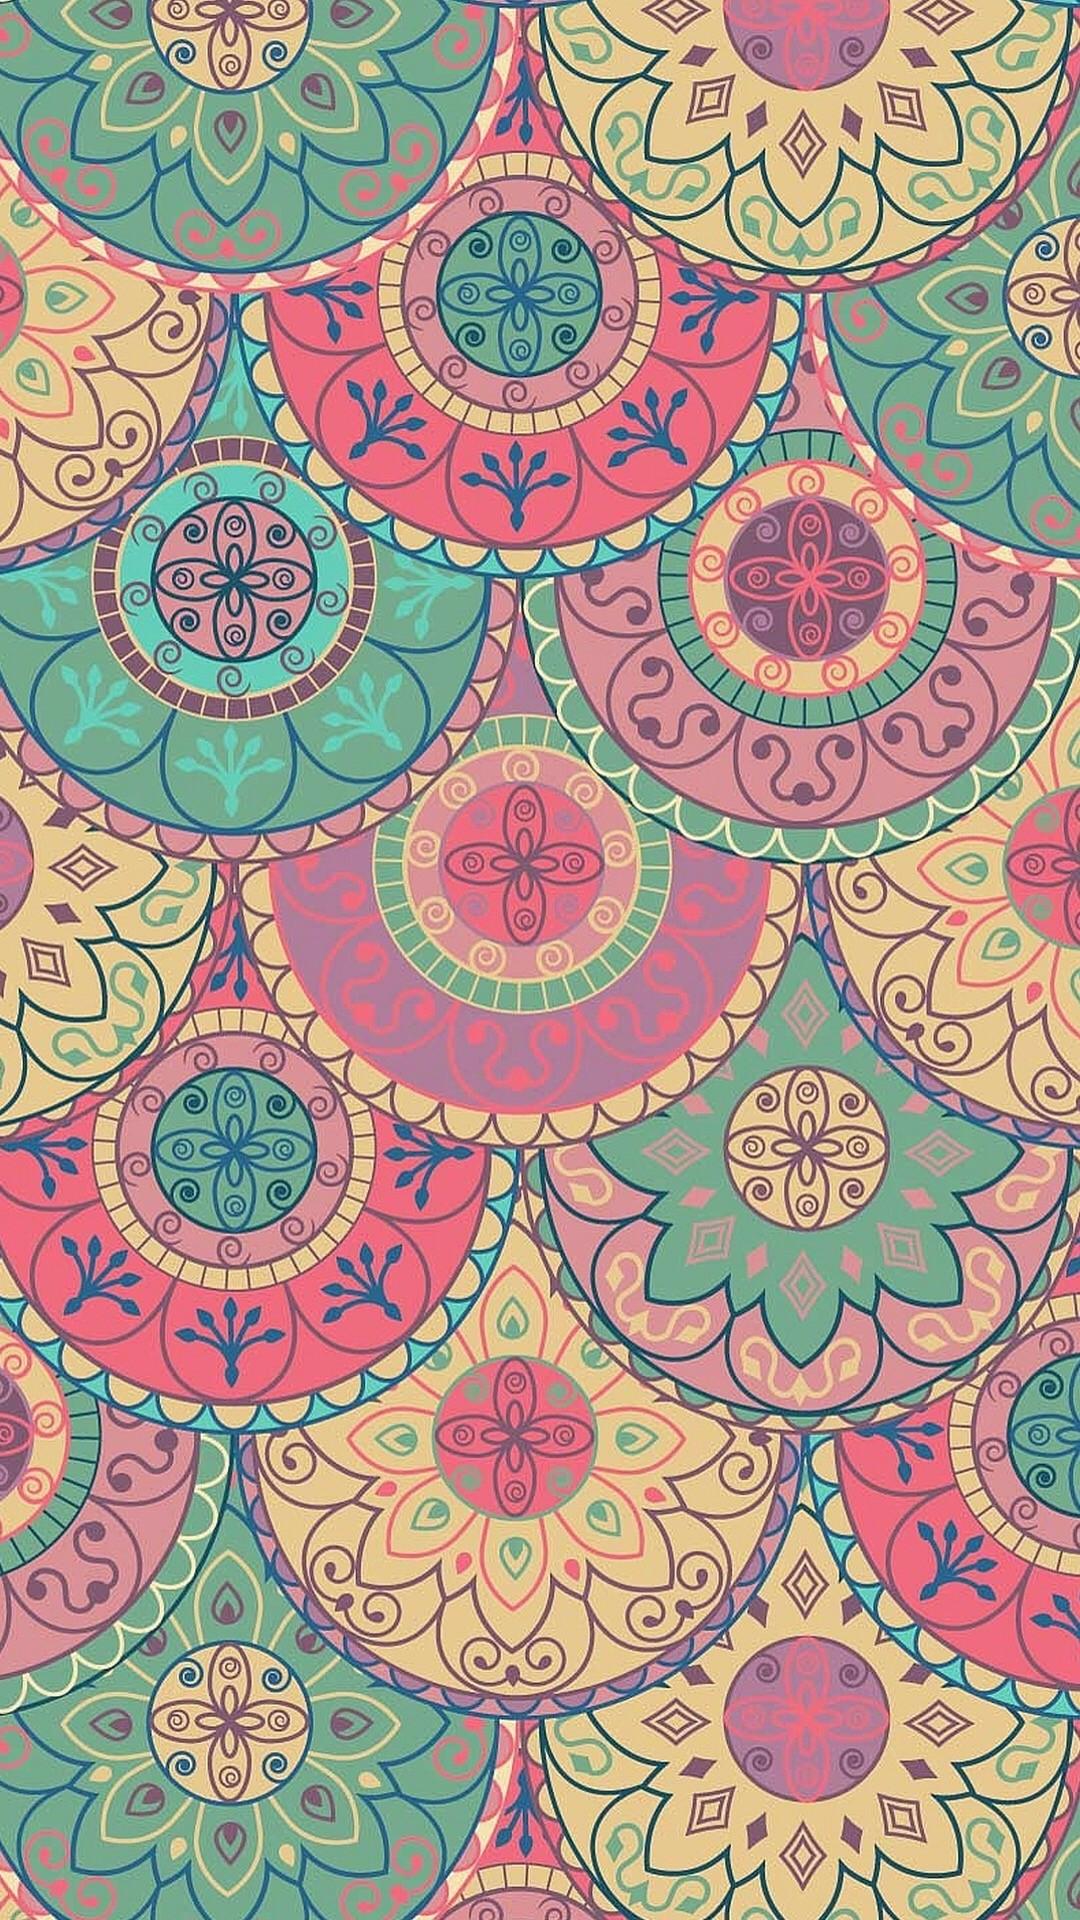 Hippie wallpaper for iPhone